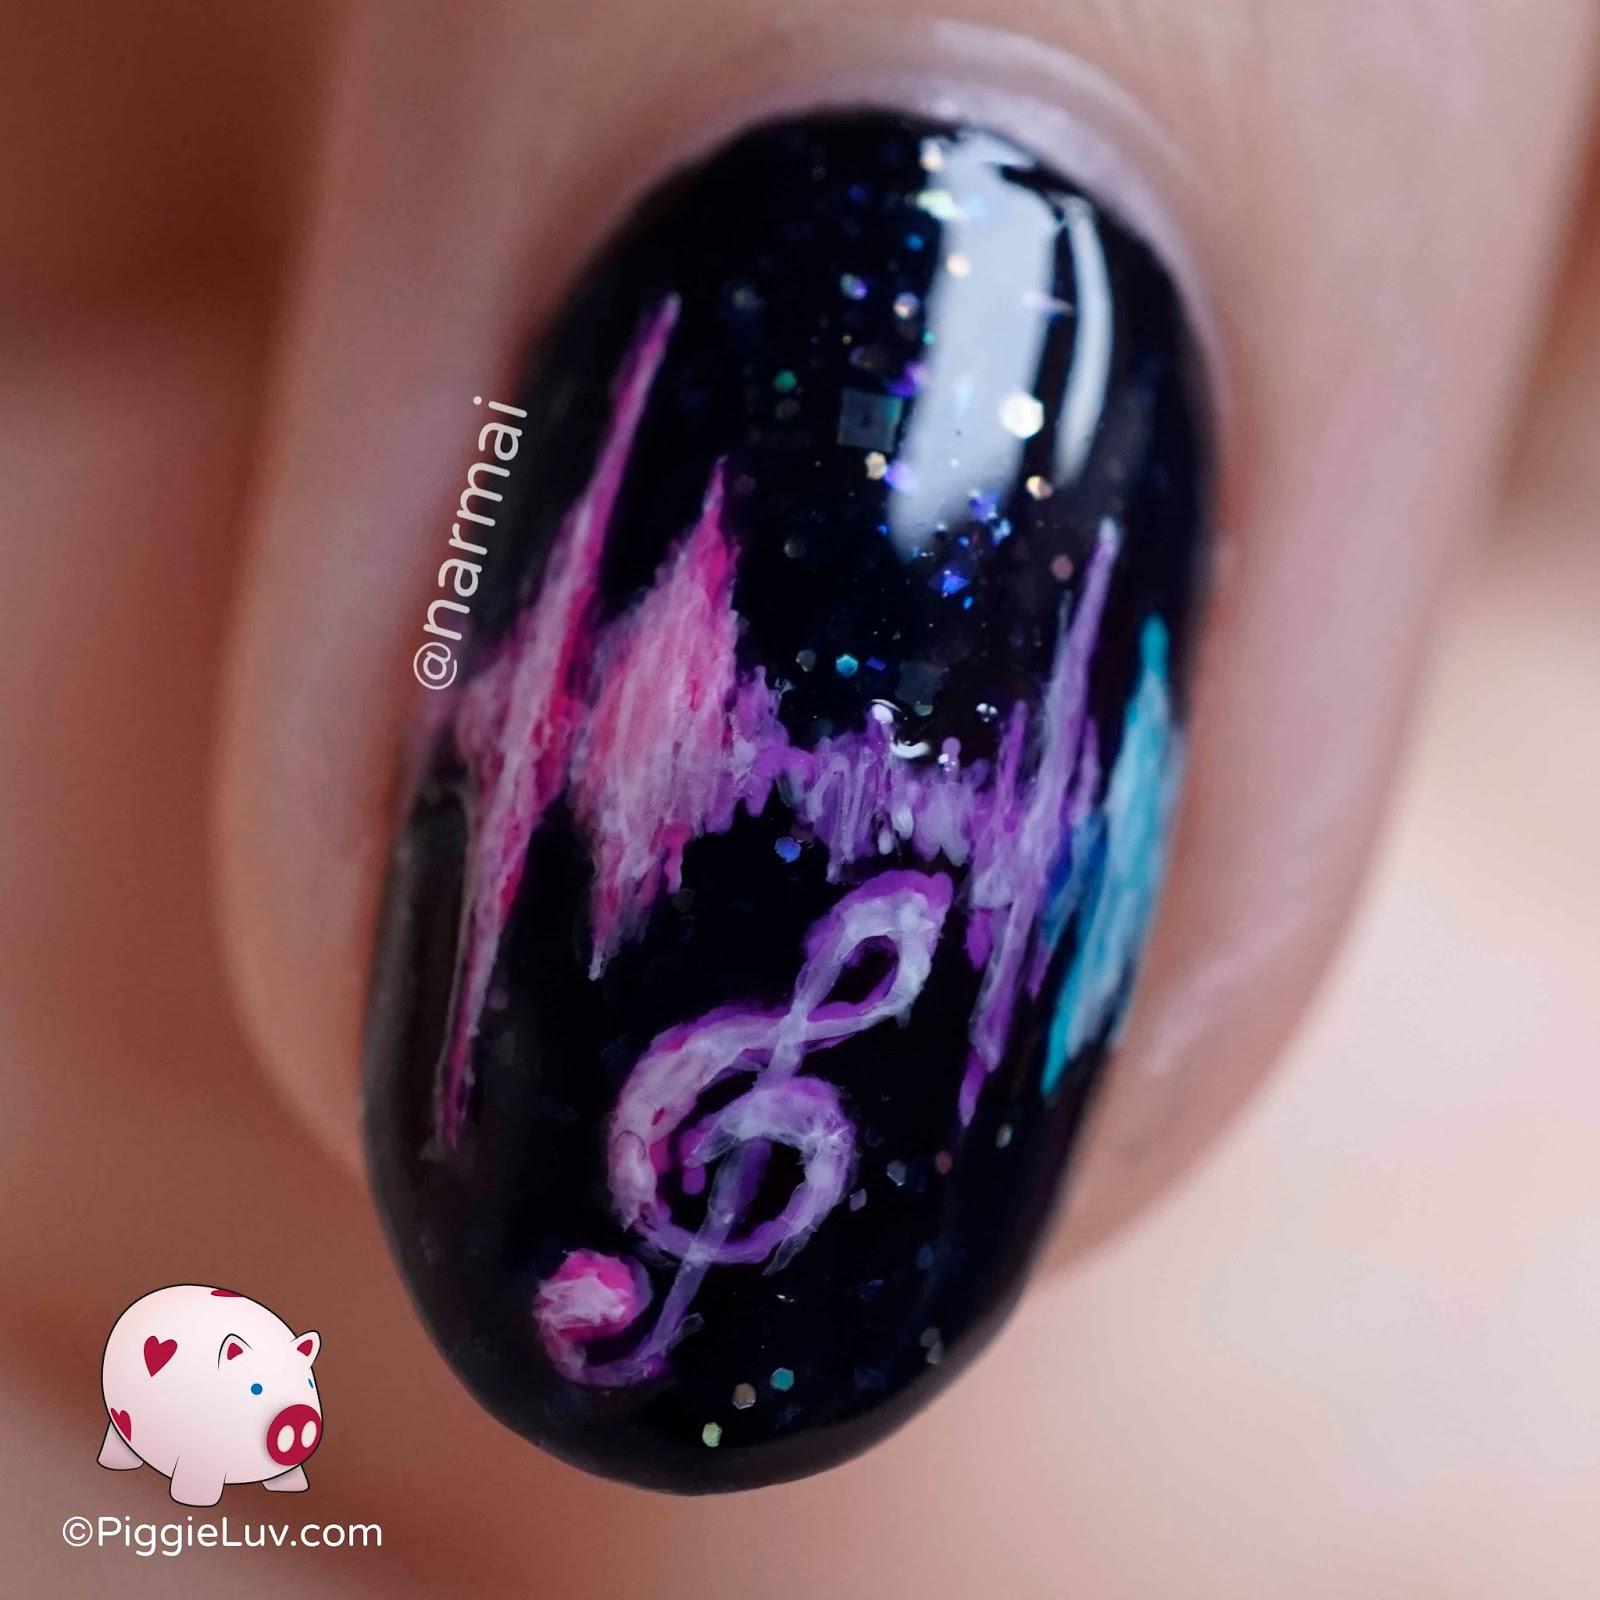 PiggieLuv: Freehand sound waves nail art